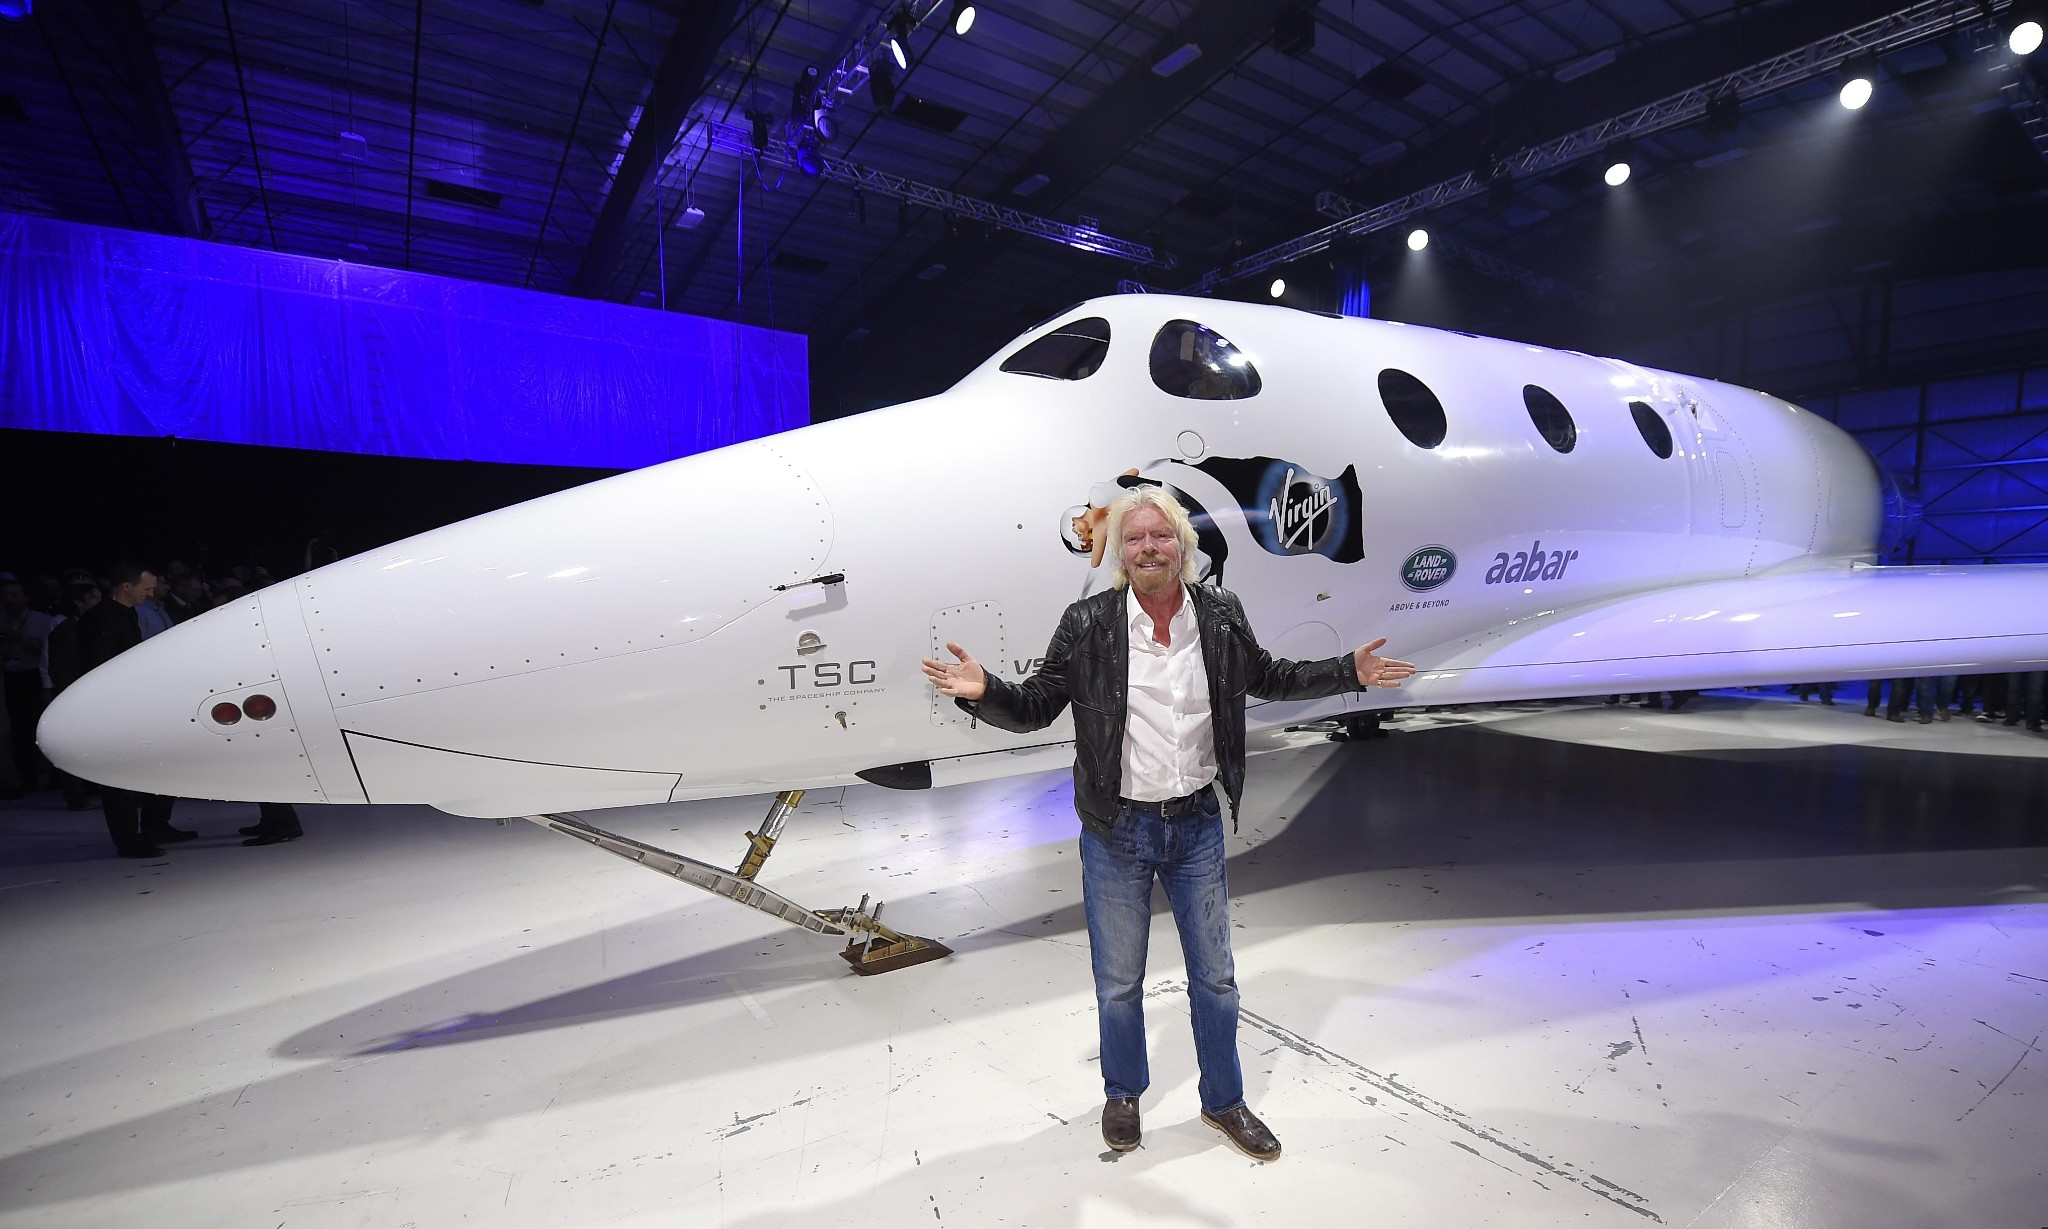 Saudi Arabia to invest $1bn in Virgin space companies